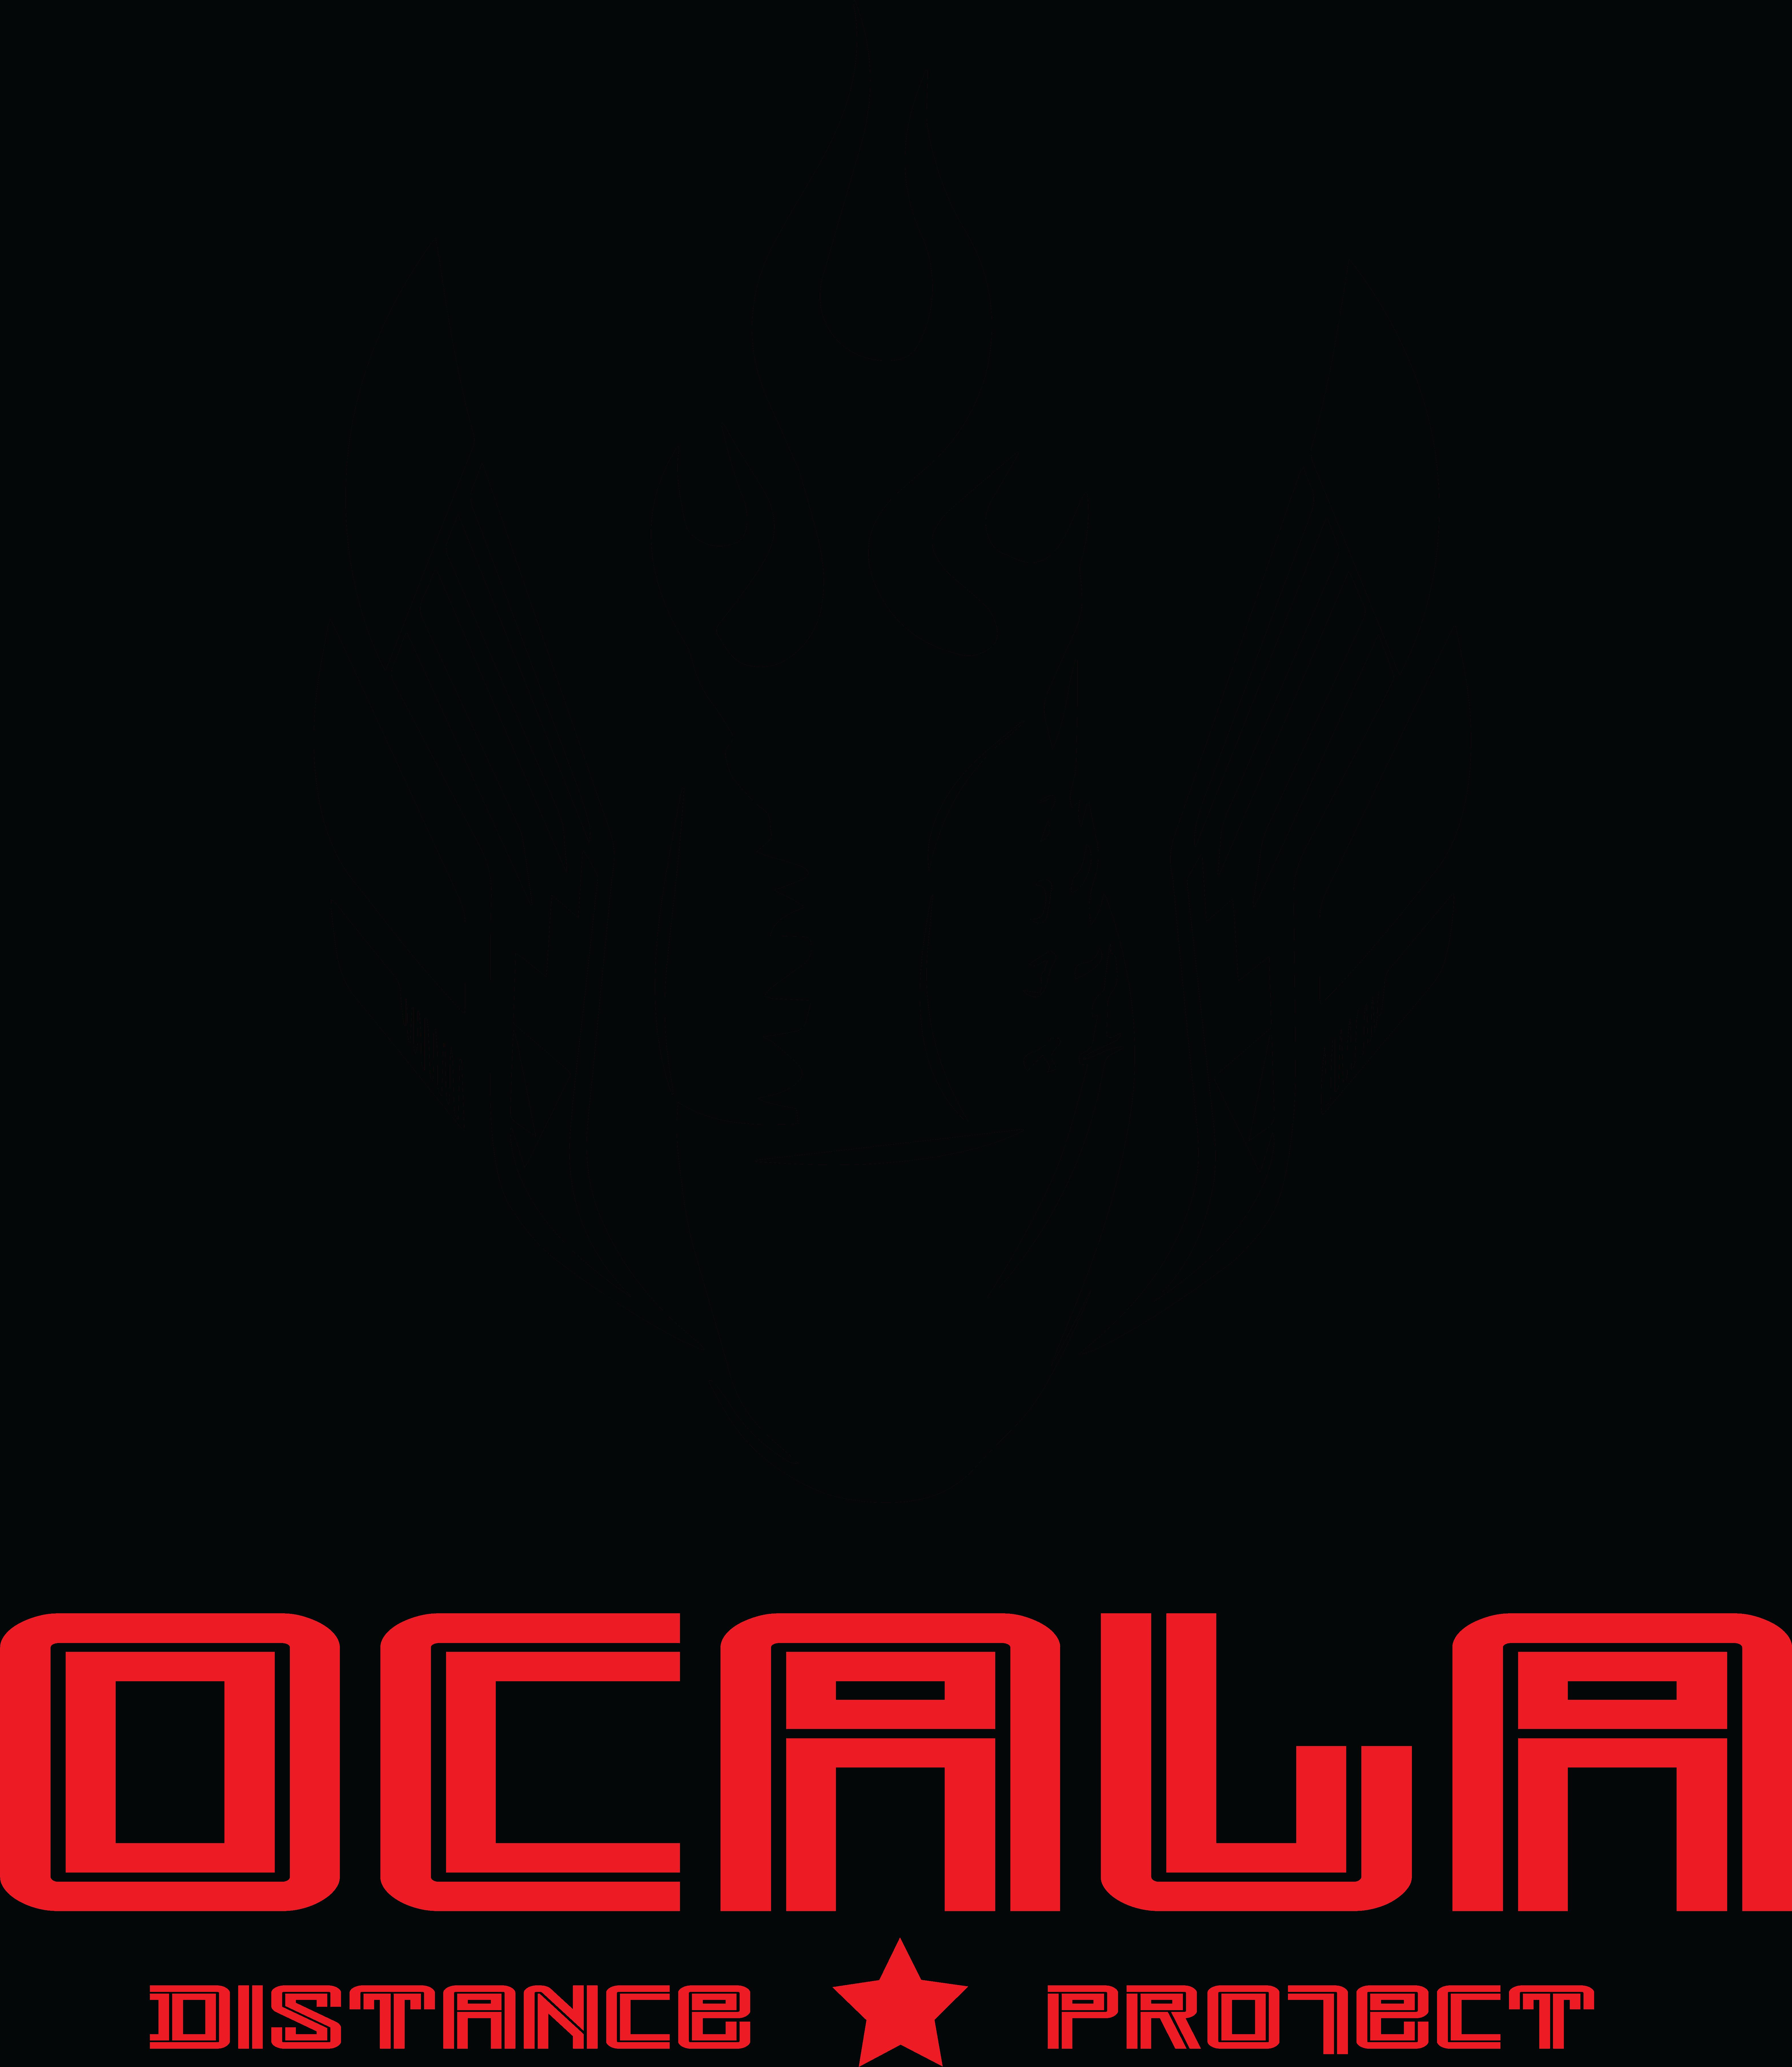 Ocala Distance Project – Fall 2020